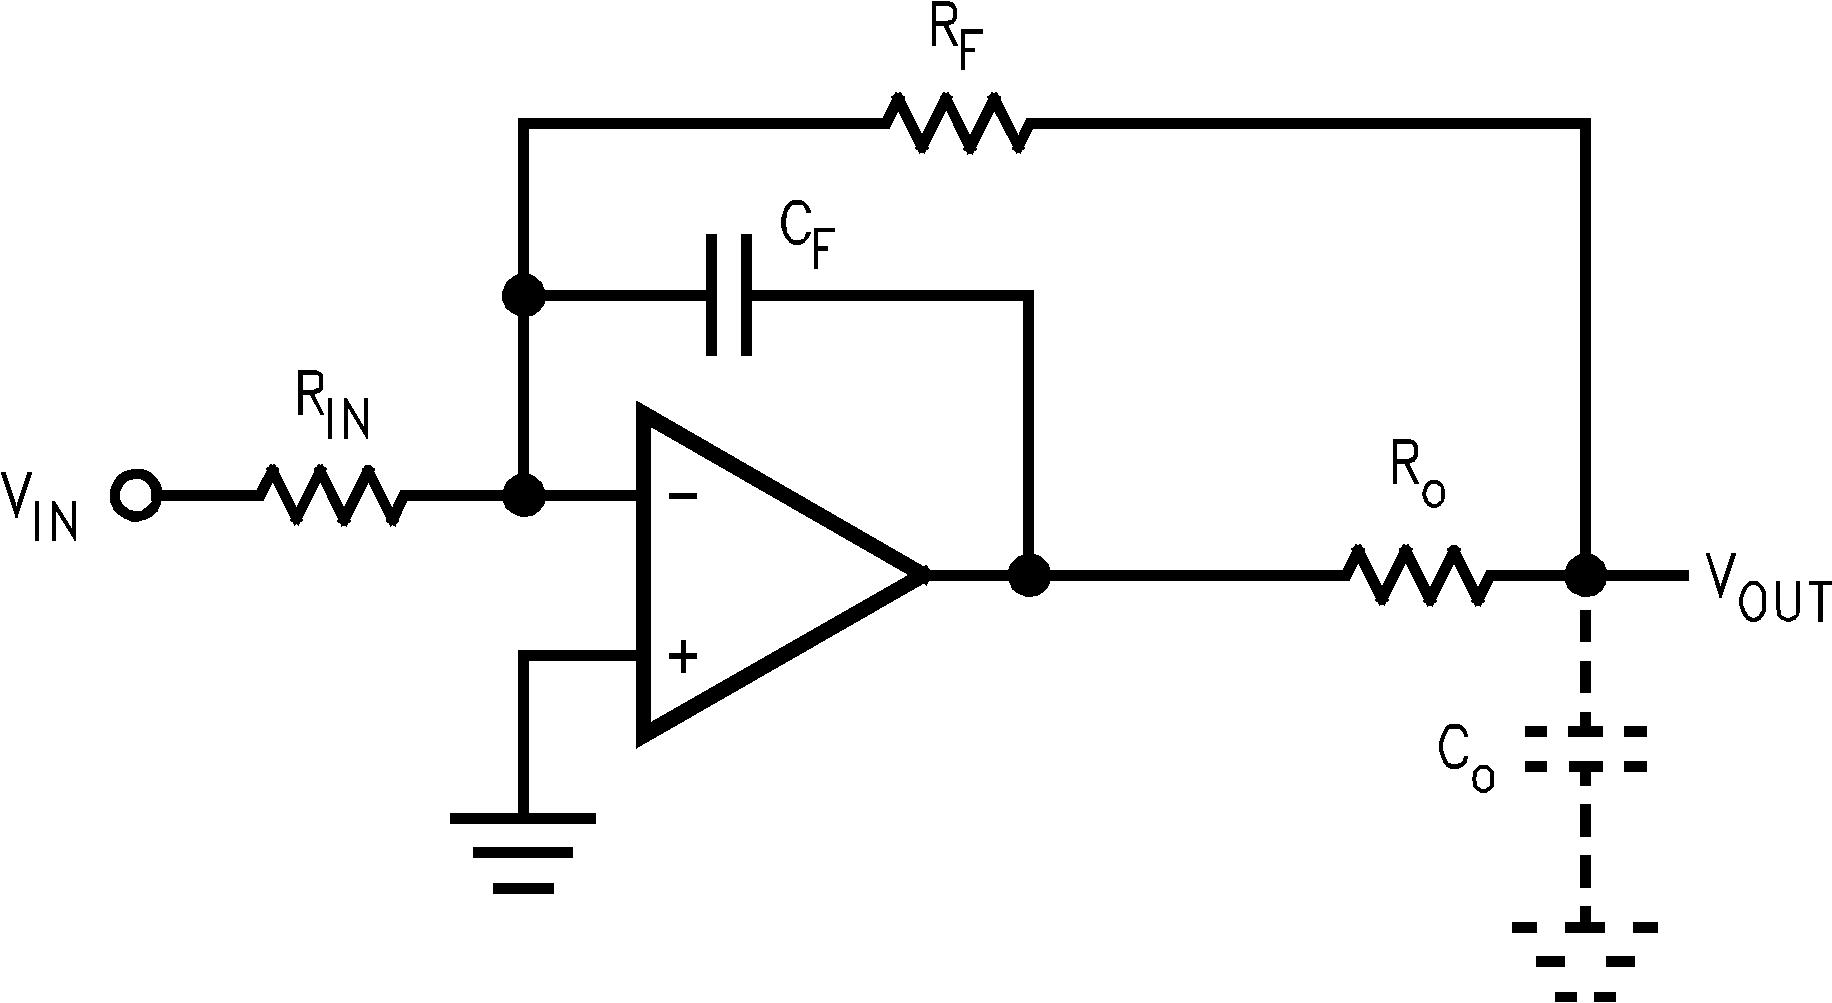 Lm Quad Low Power 10 Mhz Rail To Rail I O Operational Amplifier